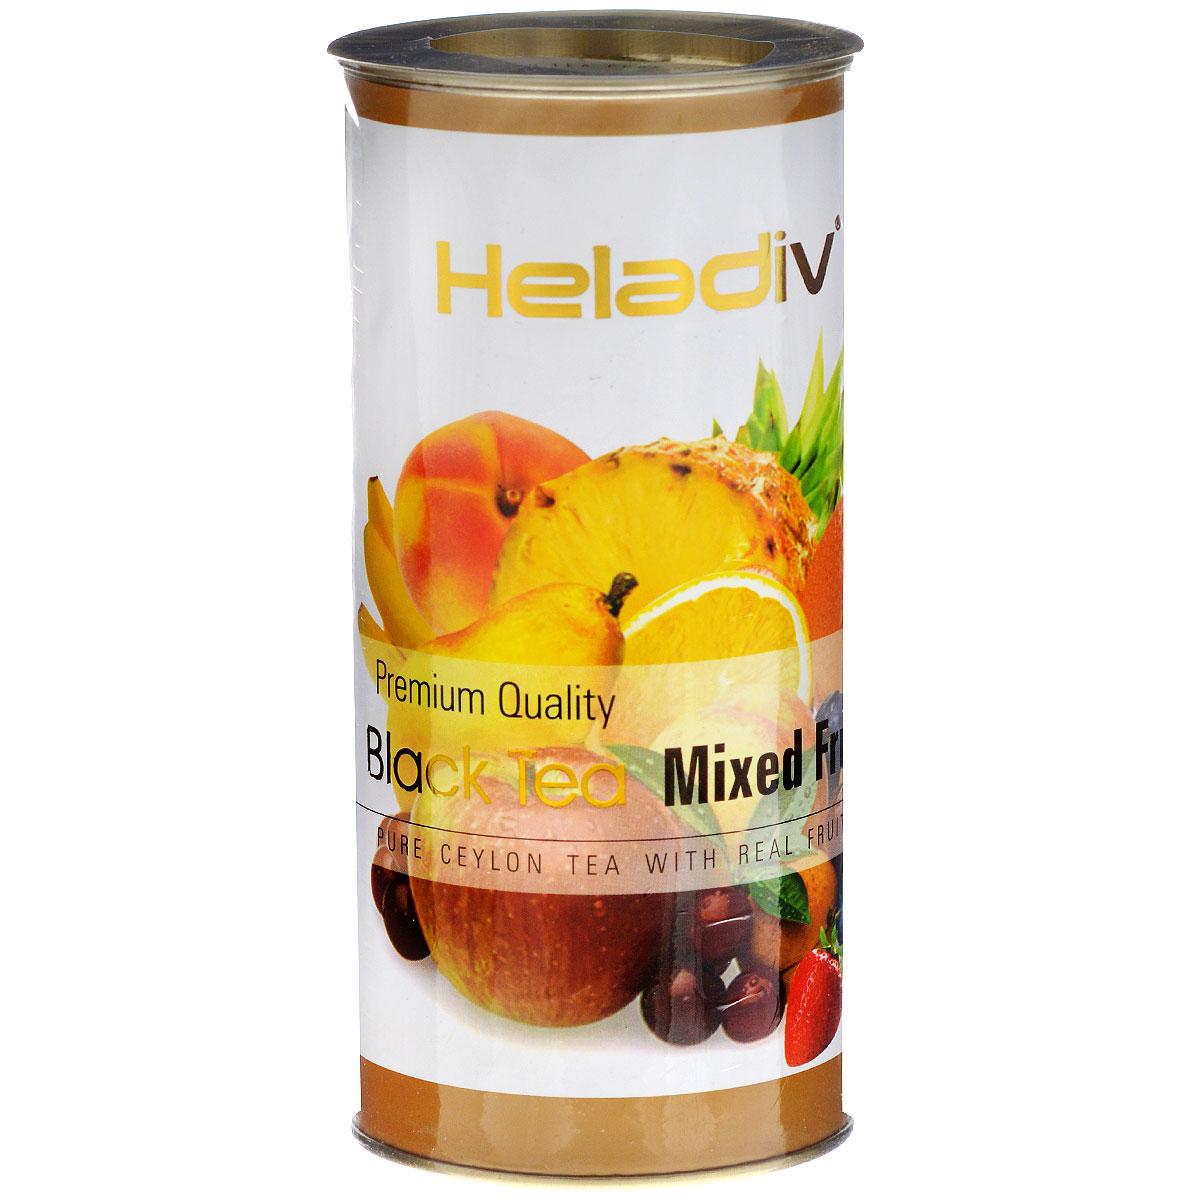 Heladiv Mixed Fruit черный фруктовый чай, 100 г цена